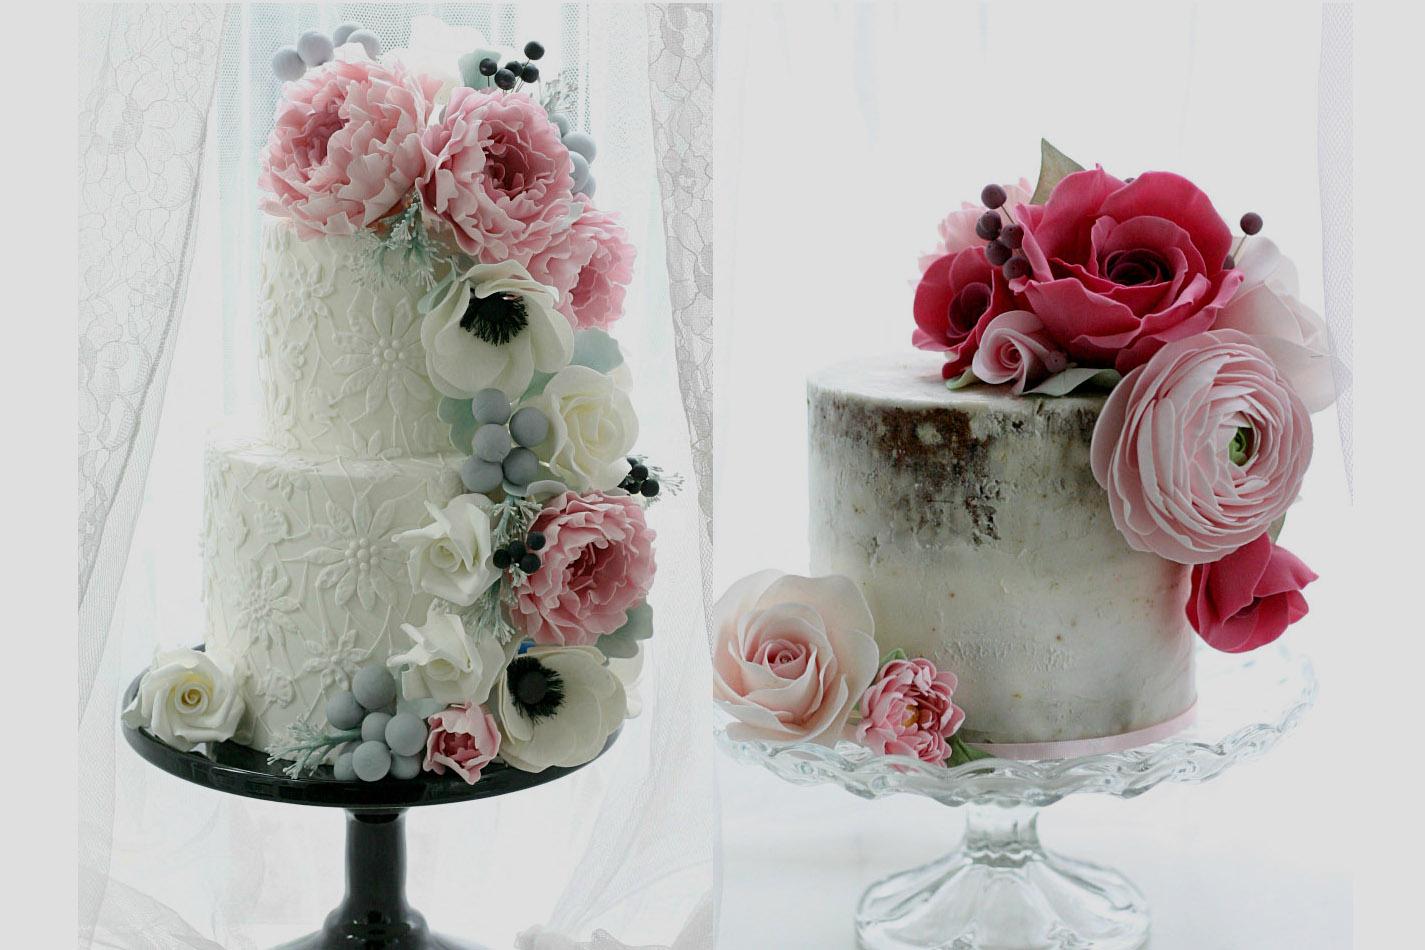 wedding-cakes-04a.jpg